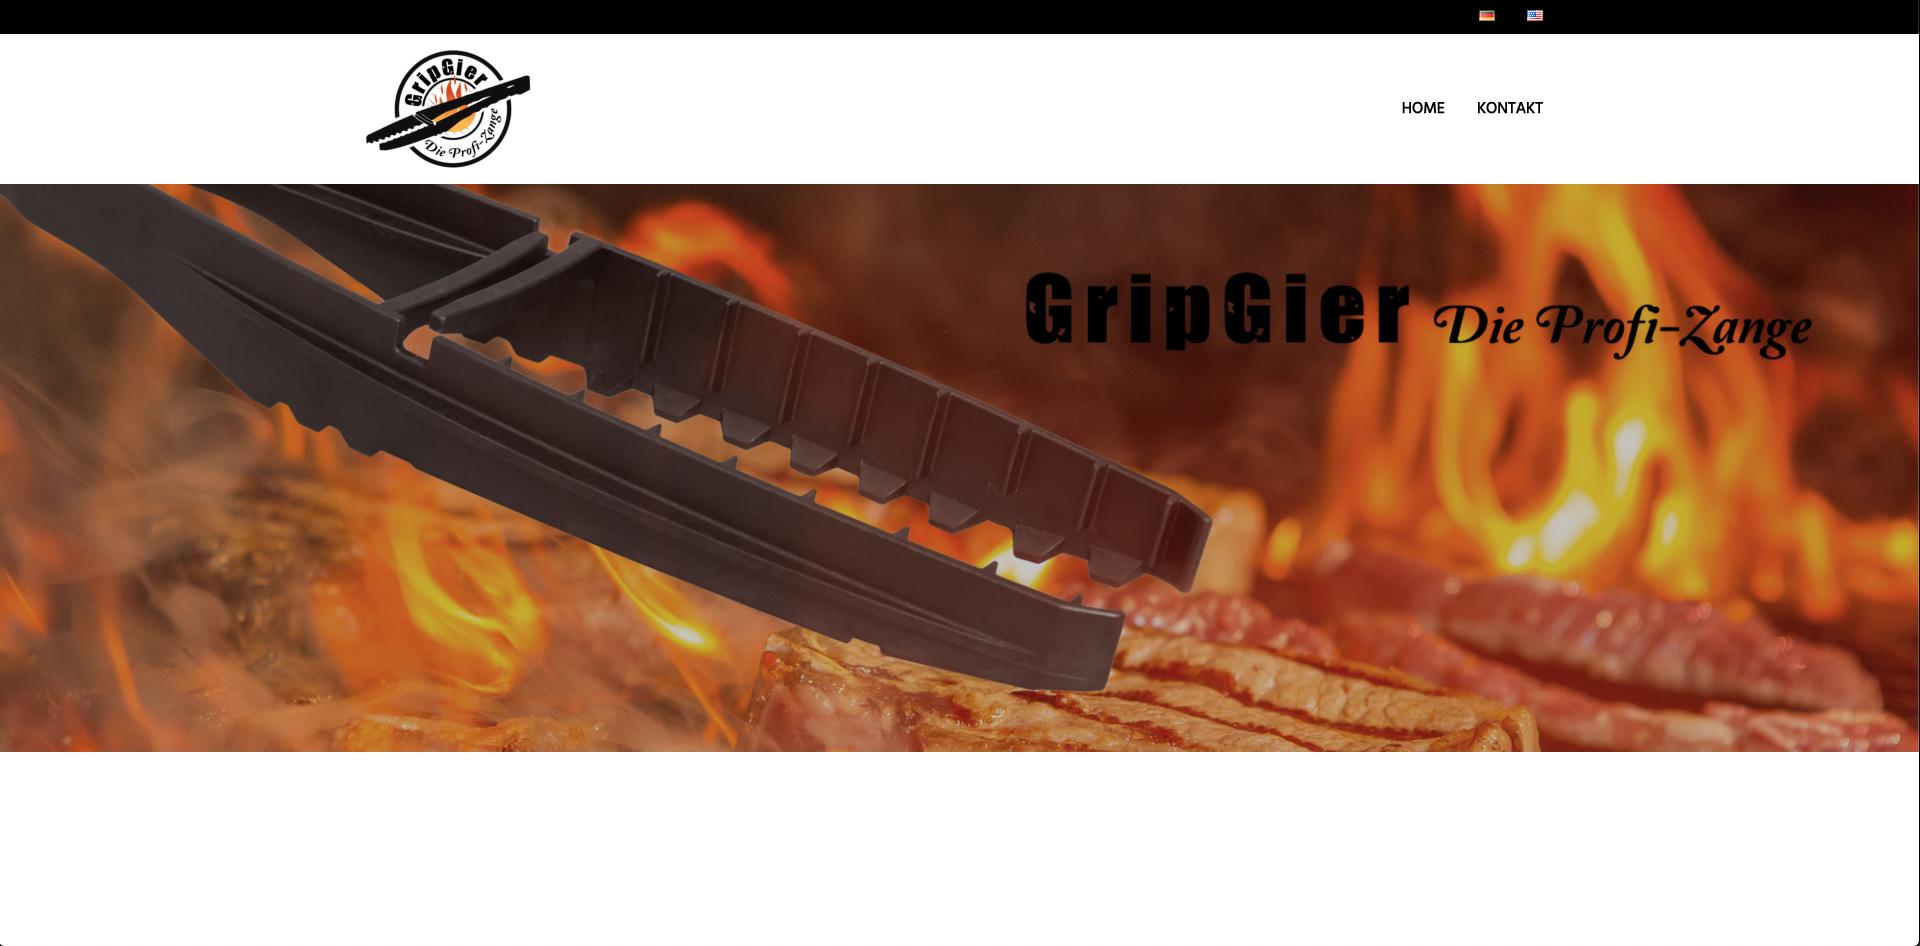 GripGier